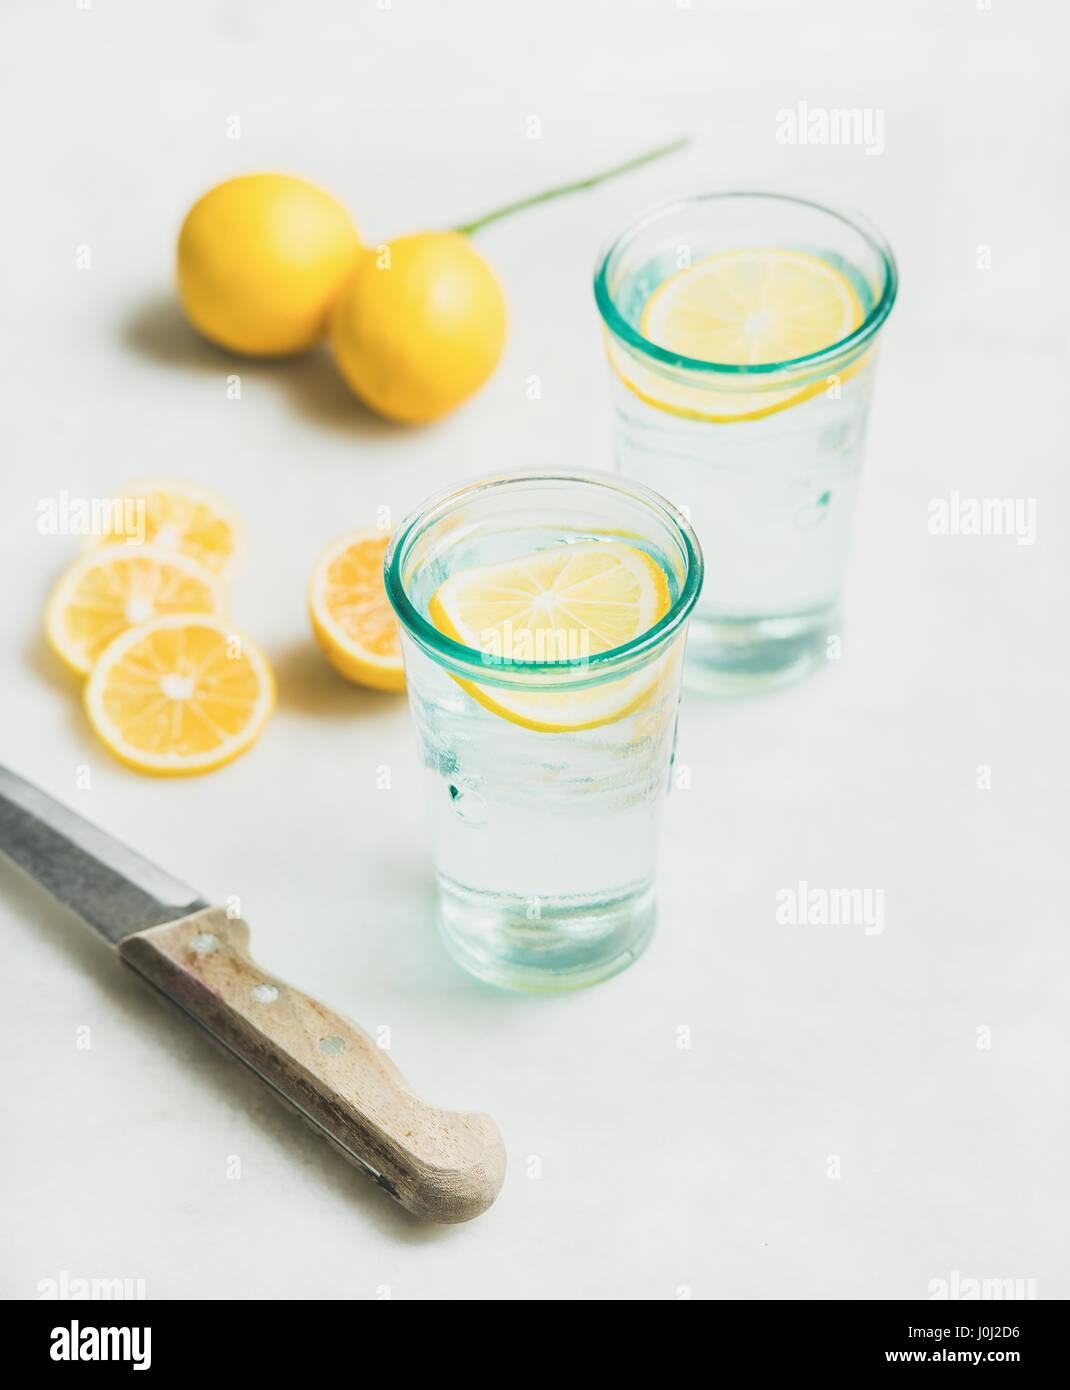 Mañana detox agua de limón en vidrios y limones frescos Foto de stock